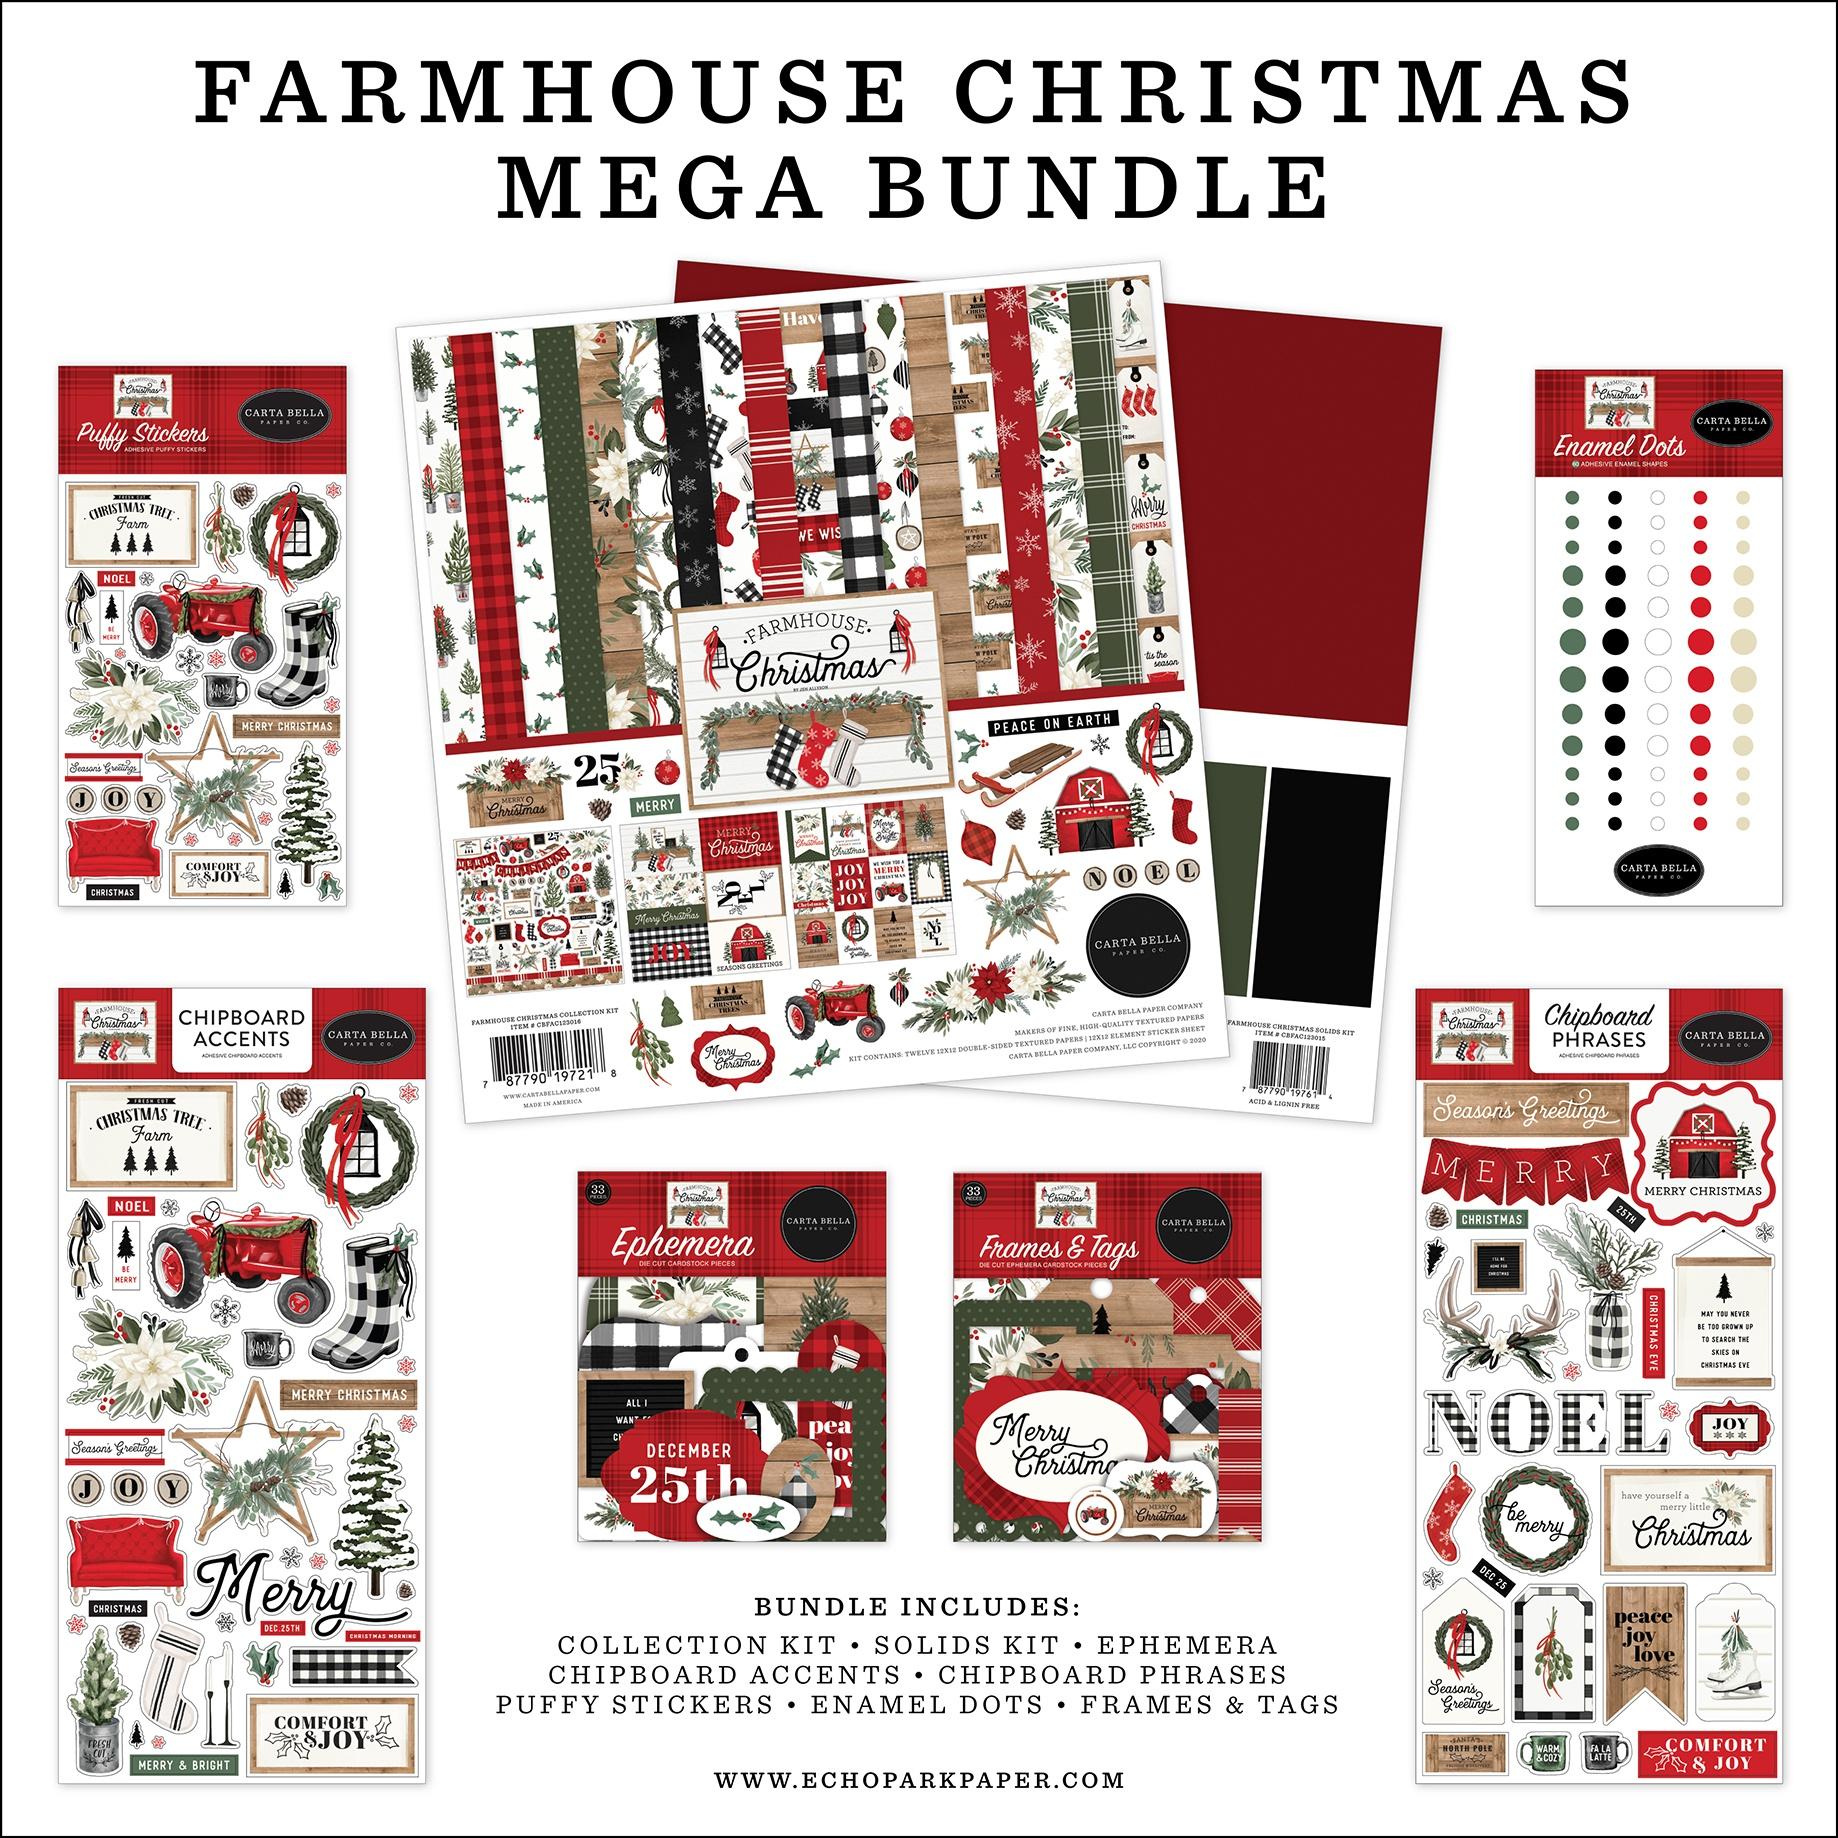 Farmhouse Christmas Mega Bundle Collection Kit